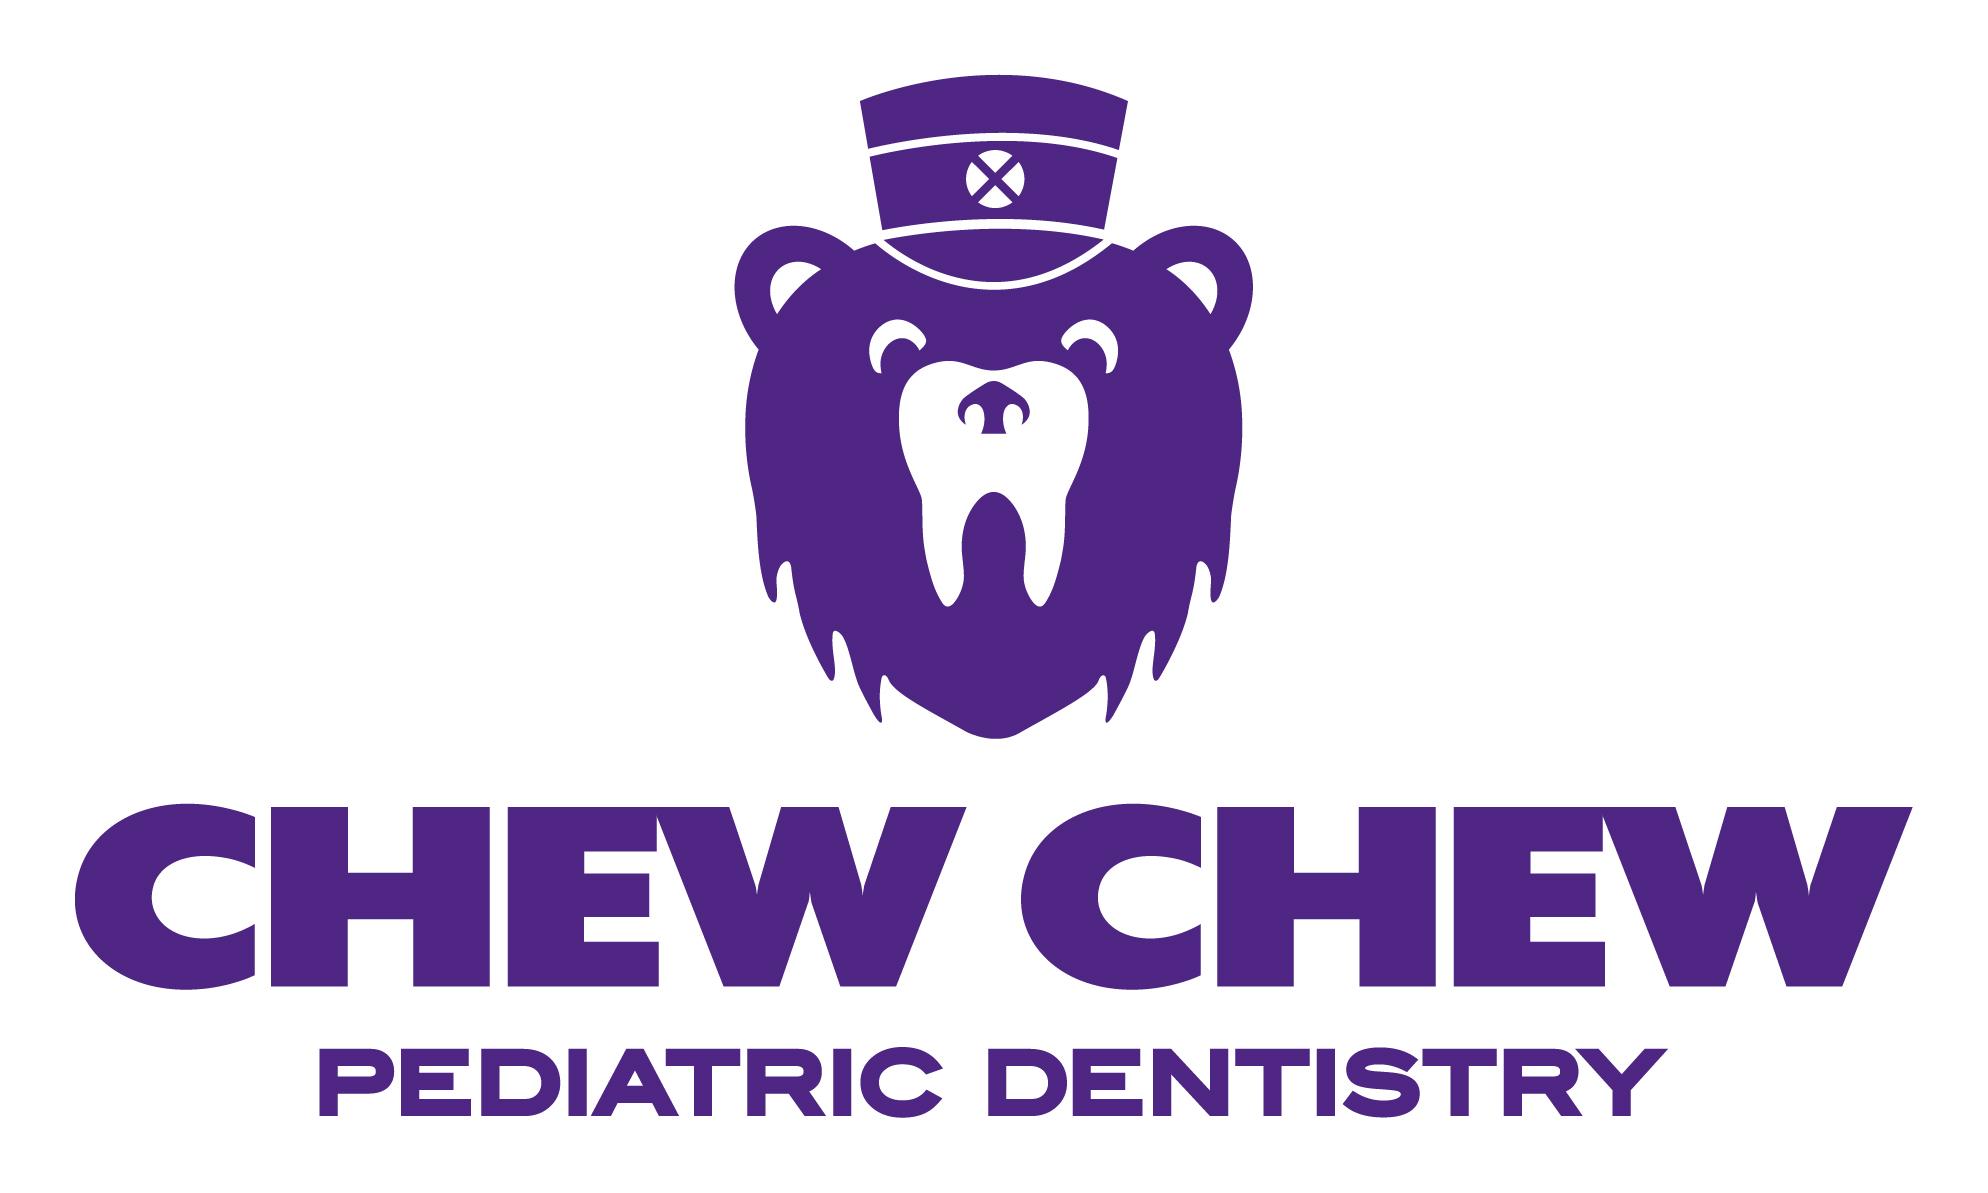 Chew Chew Pediatric Dentistry